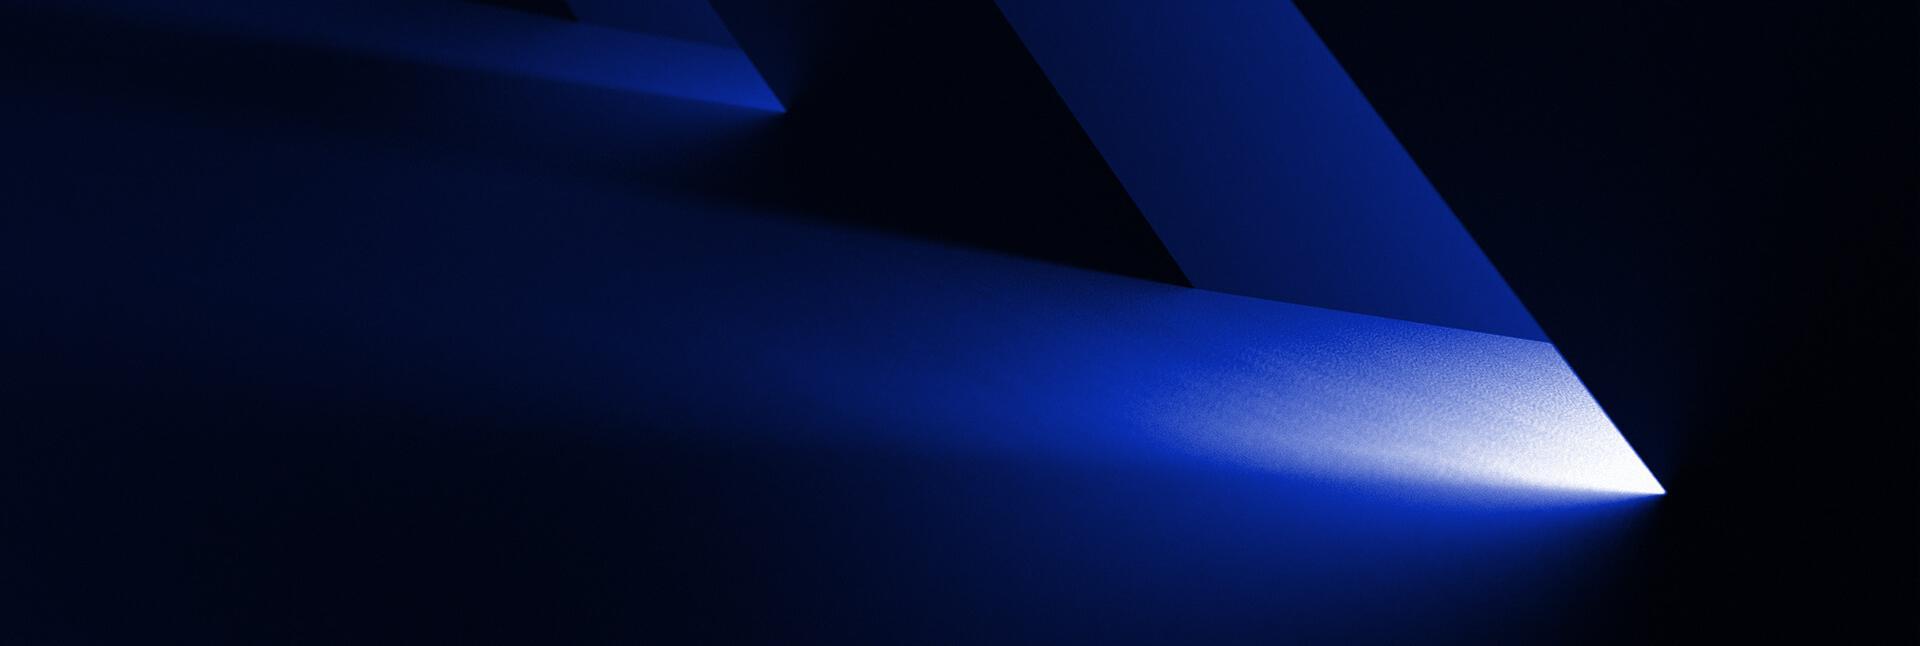 rra-background-blue-4-2021.jpg